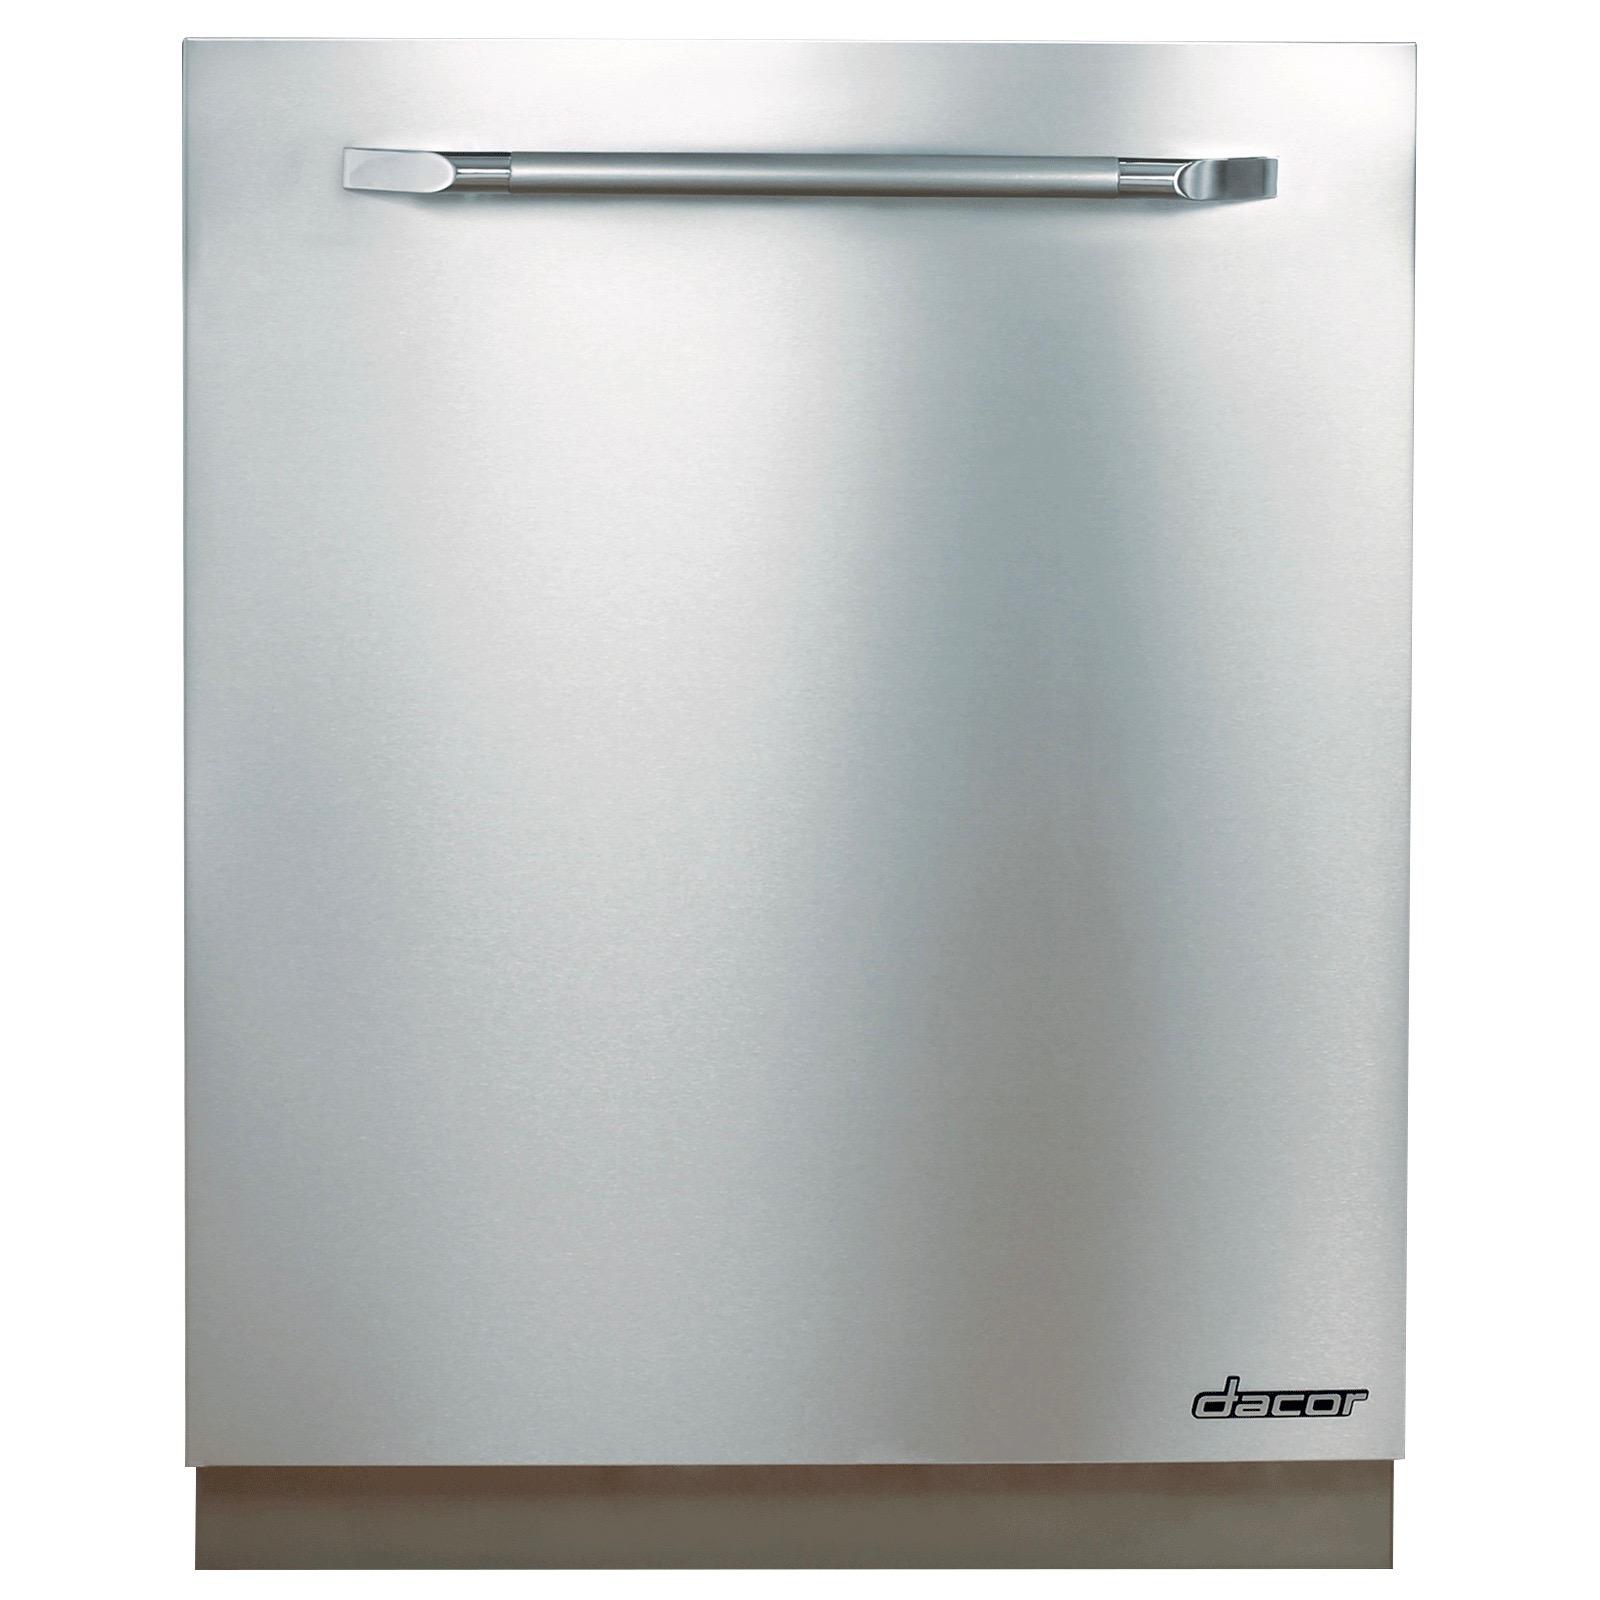 Dishwashers_RDW24S_1600x1600_72dpi